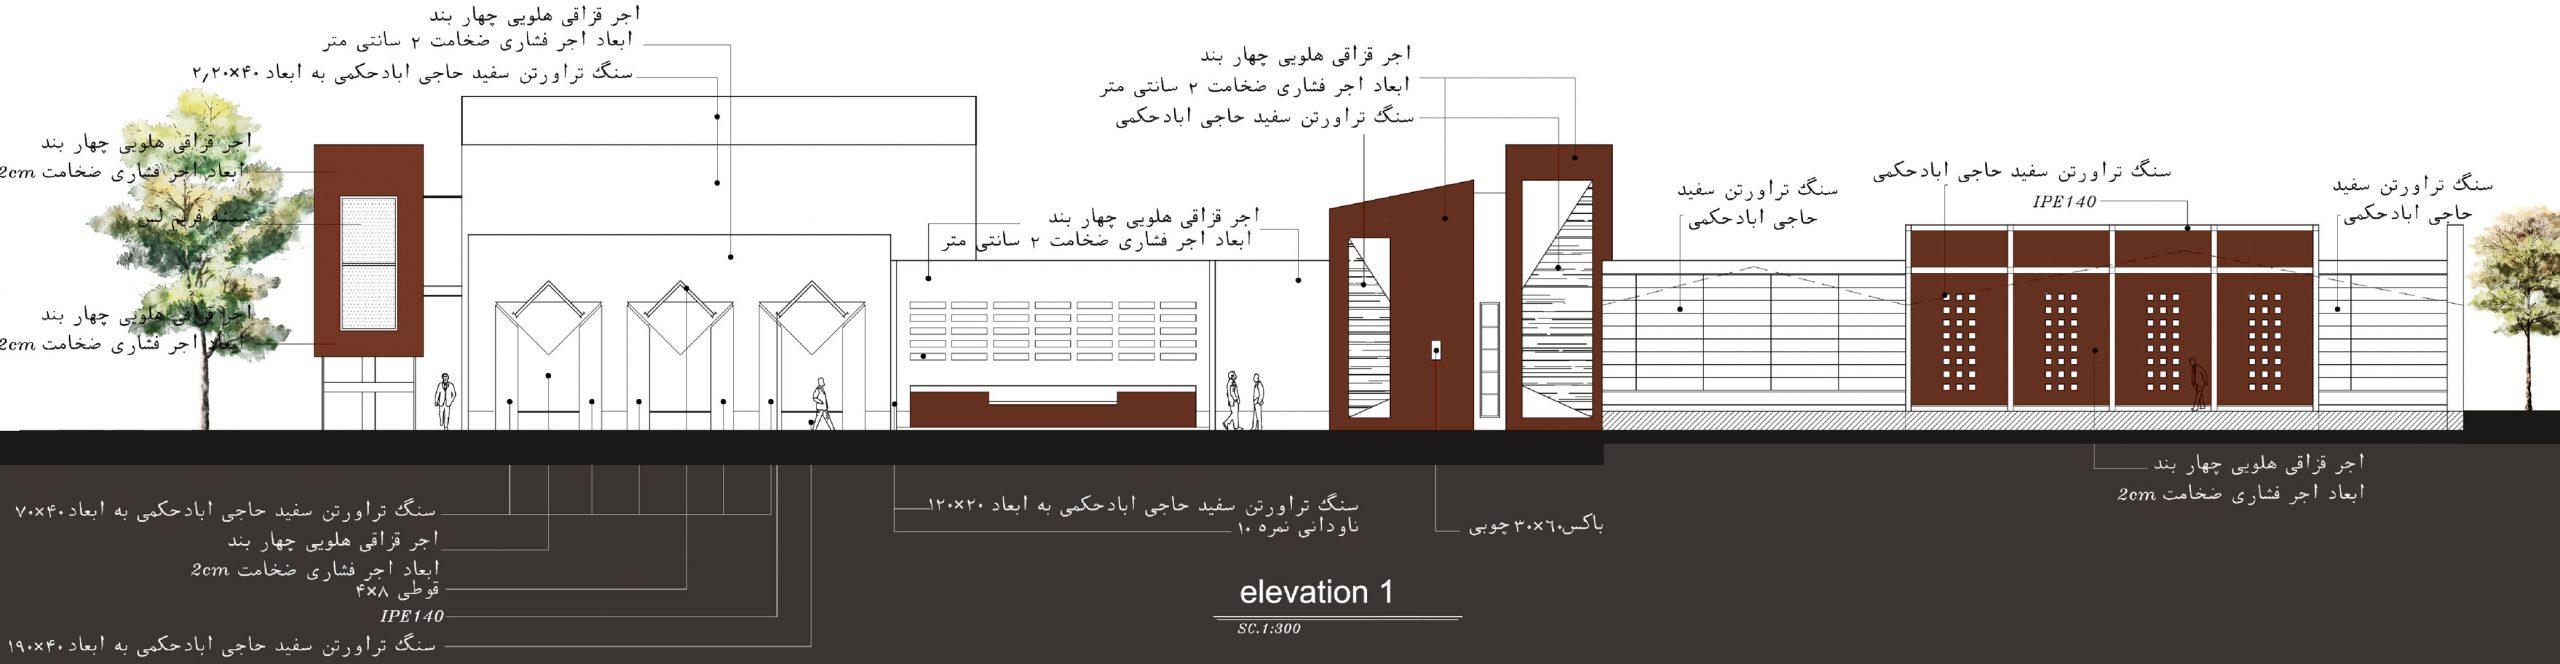 IRANIAN HOTEL DOC (5)